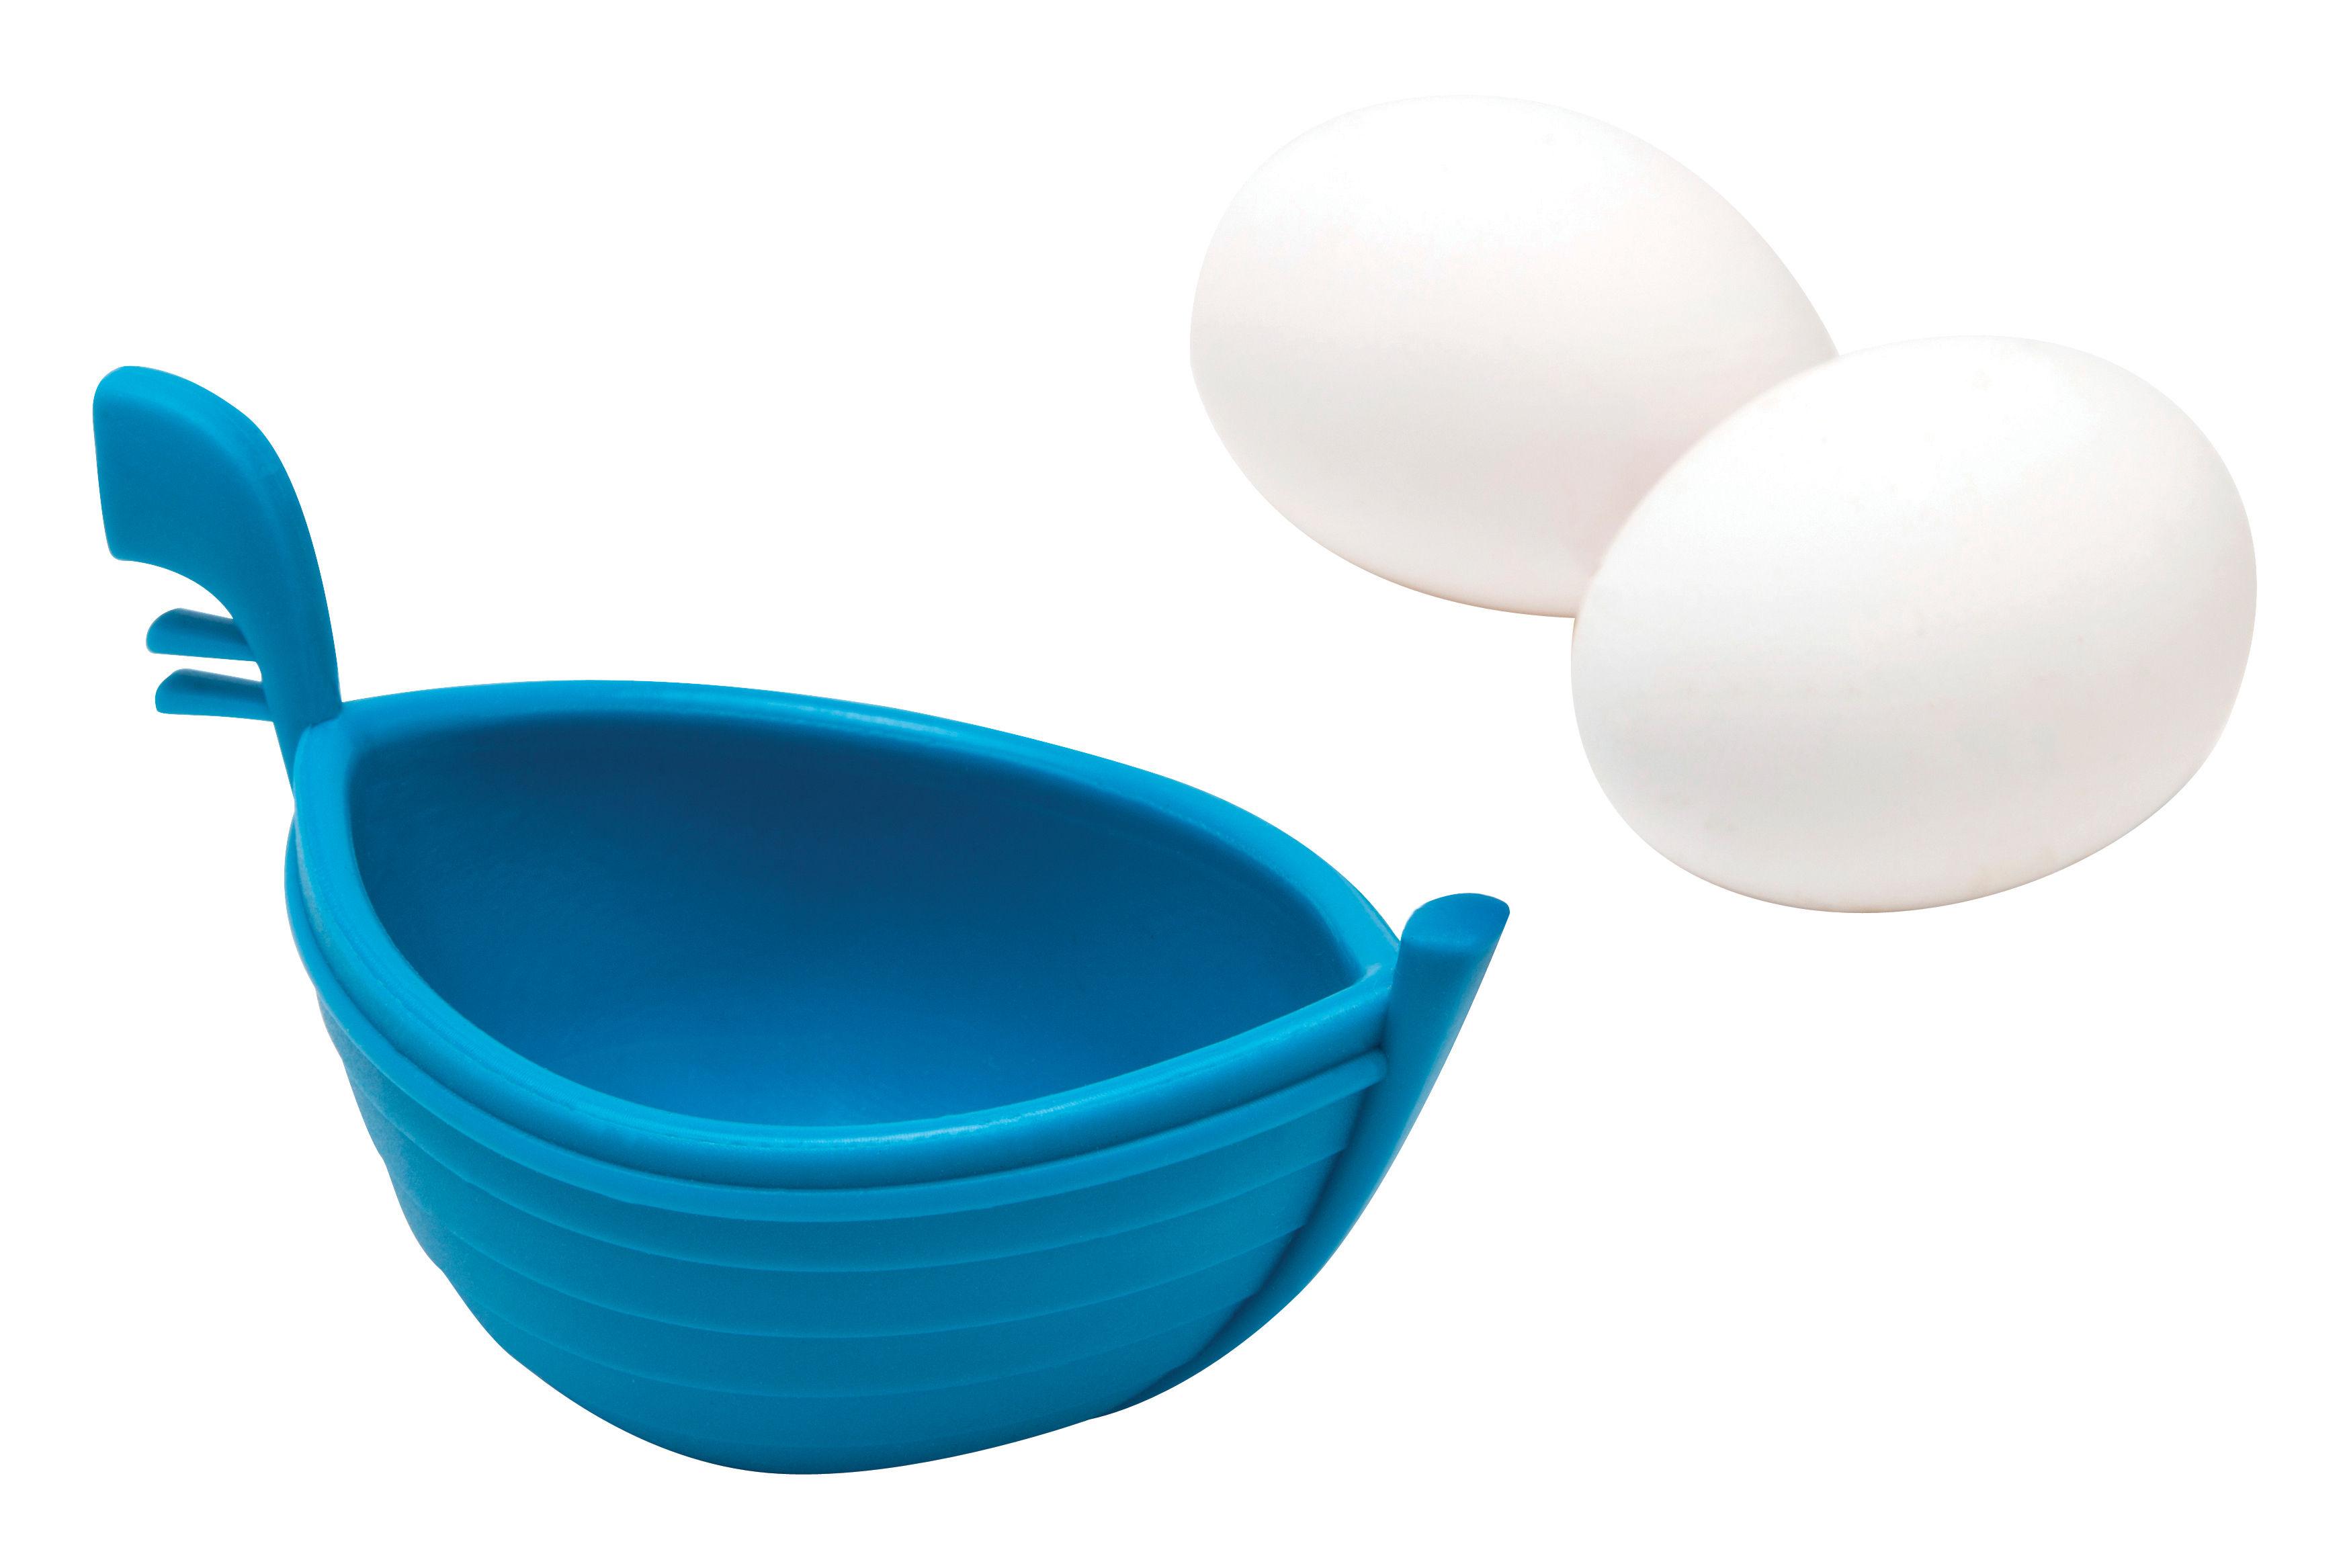 Kitchenware - Kitchen Equipment - Eggondola Egg boiler - Egg poacher by Pa Design - Blue - Flexible silicone